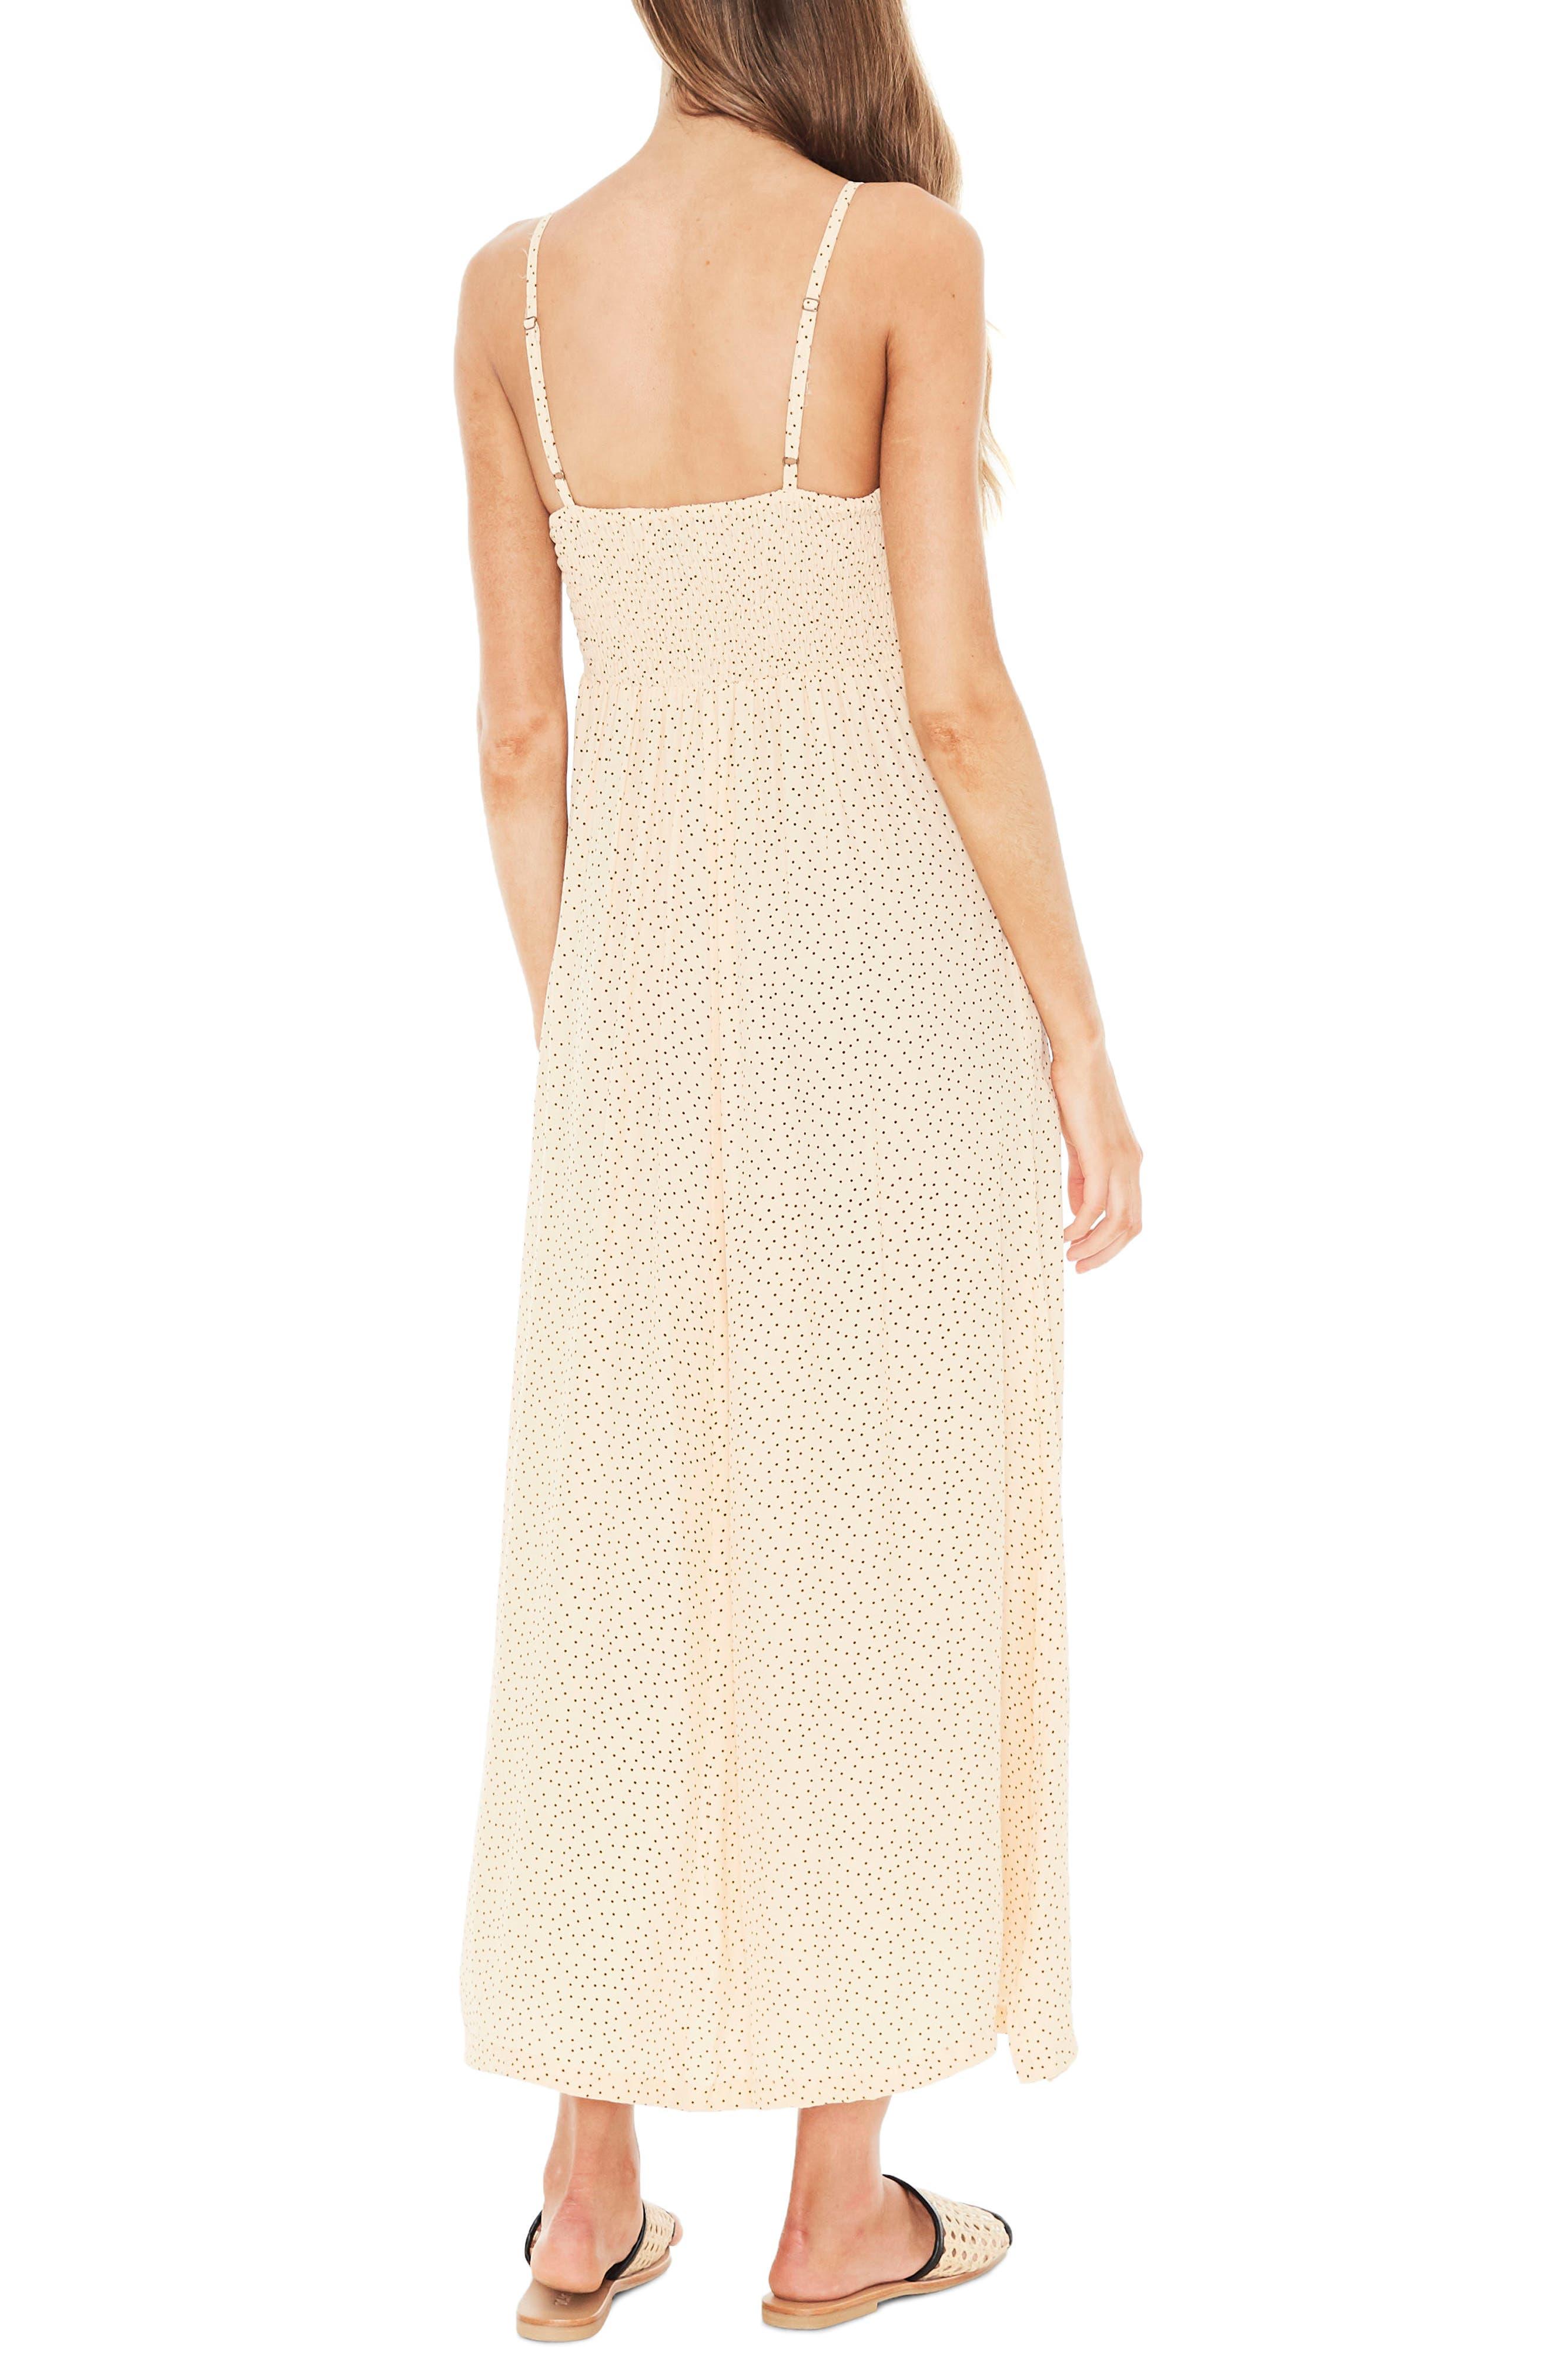 Mirador Lace-Up Midi Dress,                             Alternate thumbnail 2, color,                             900